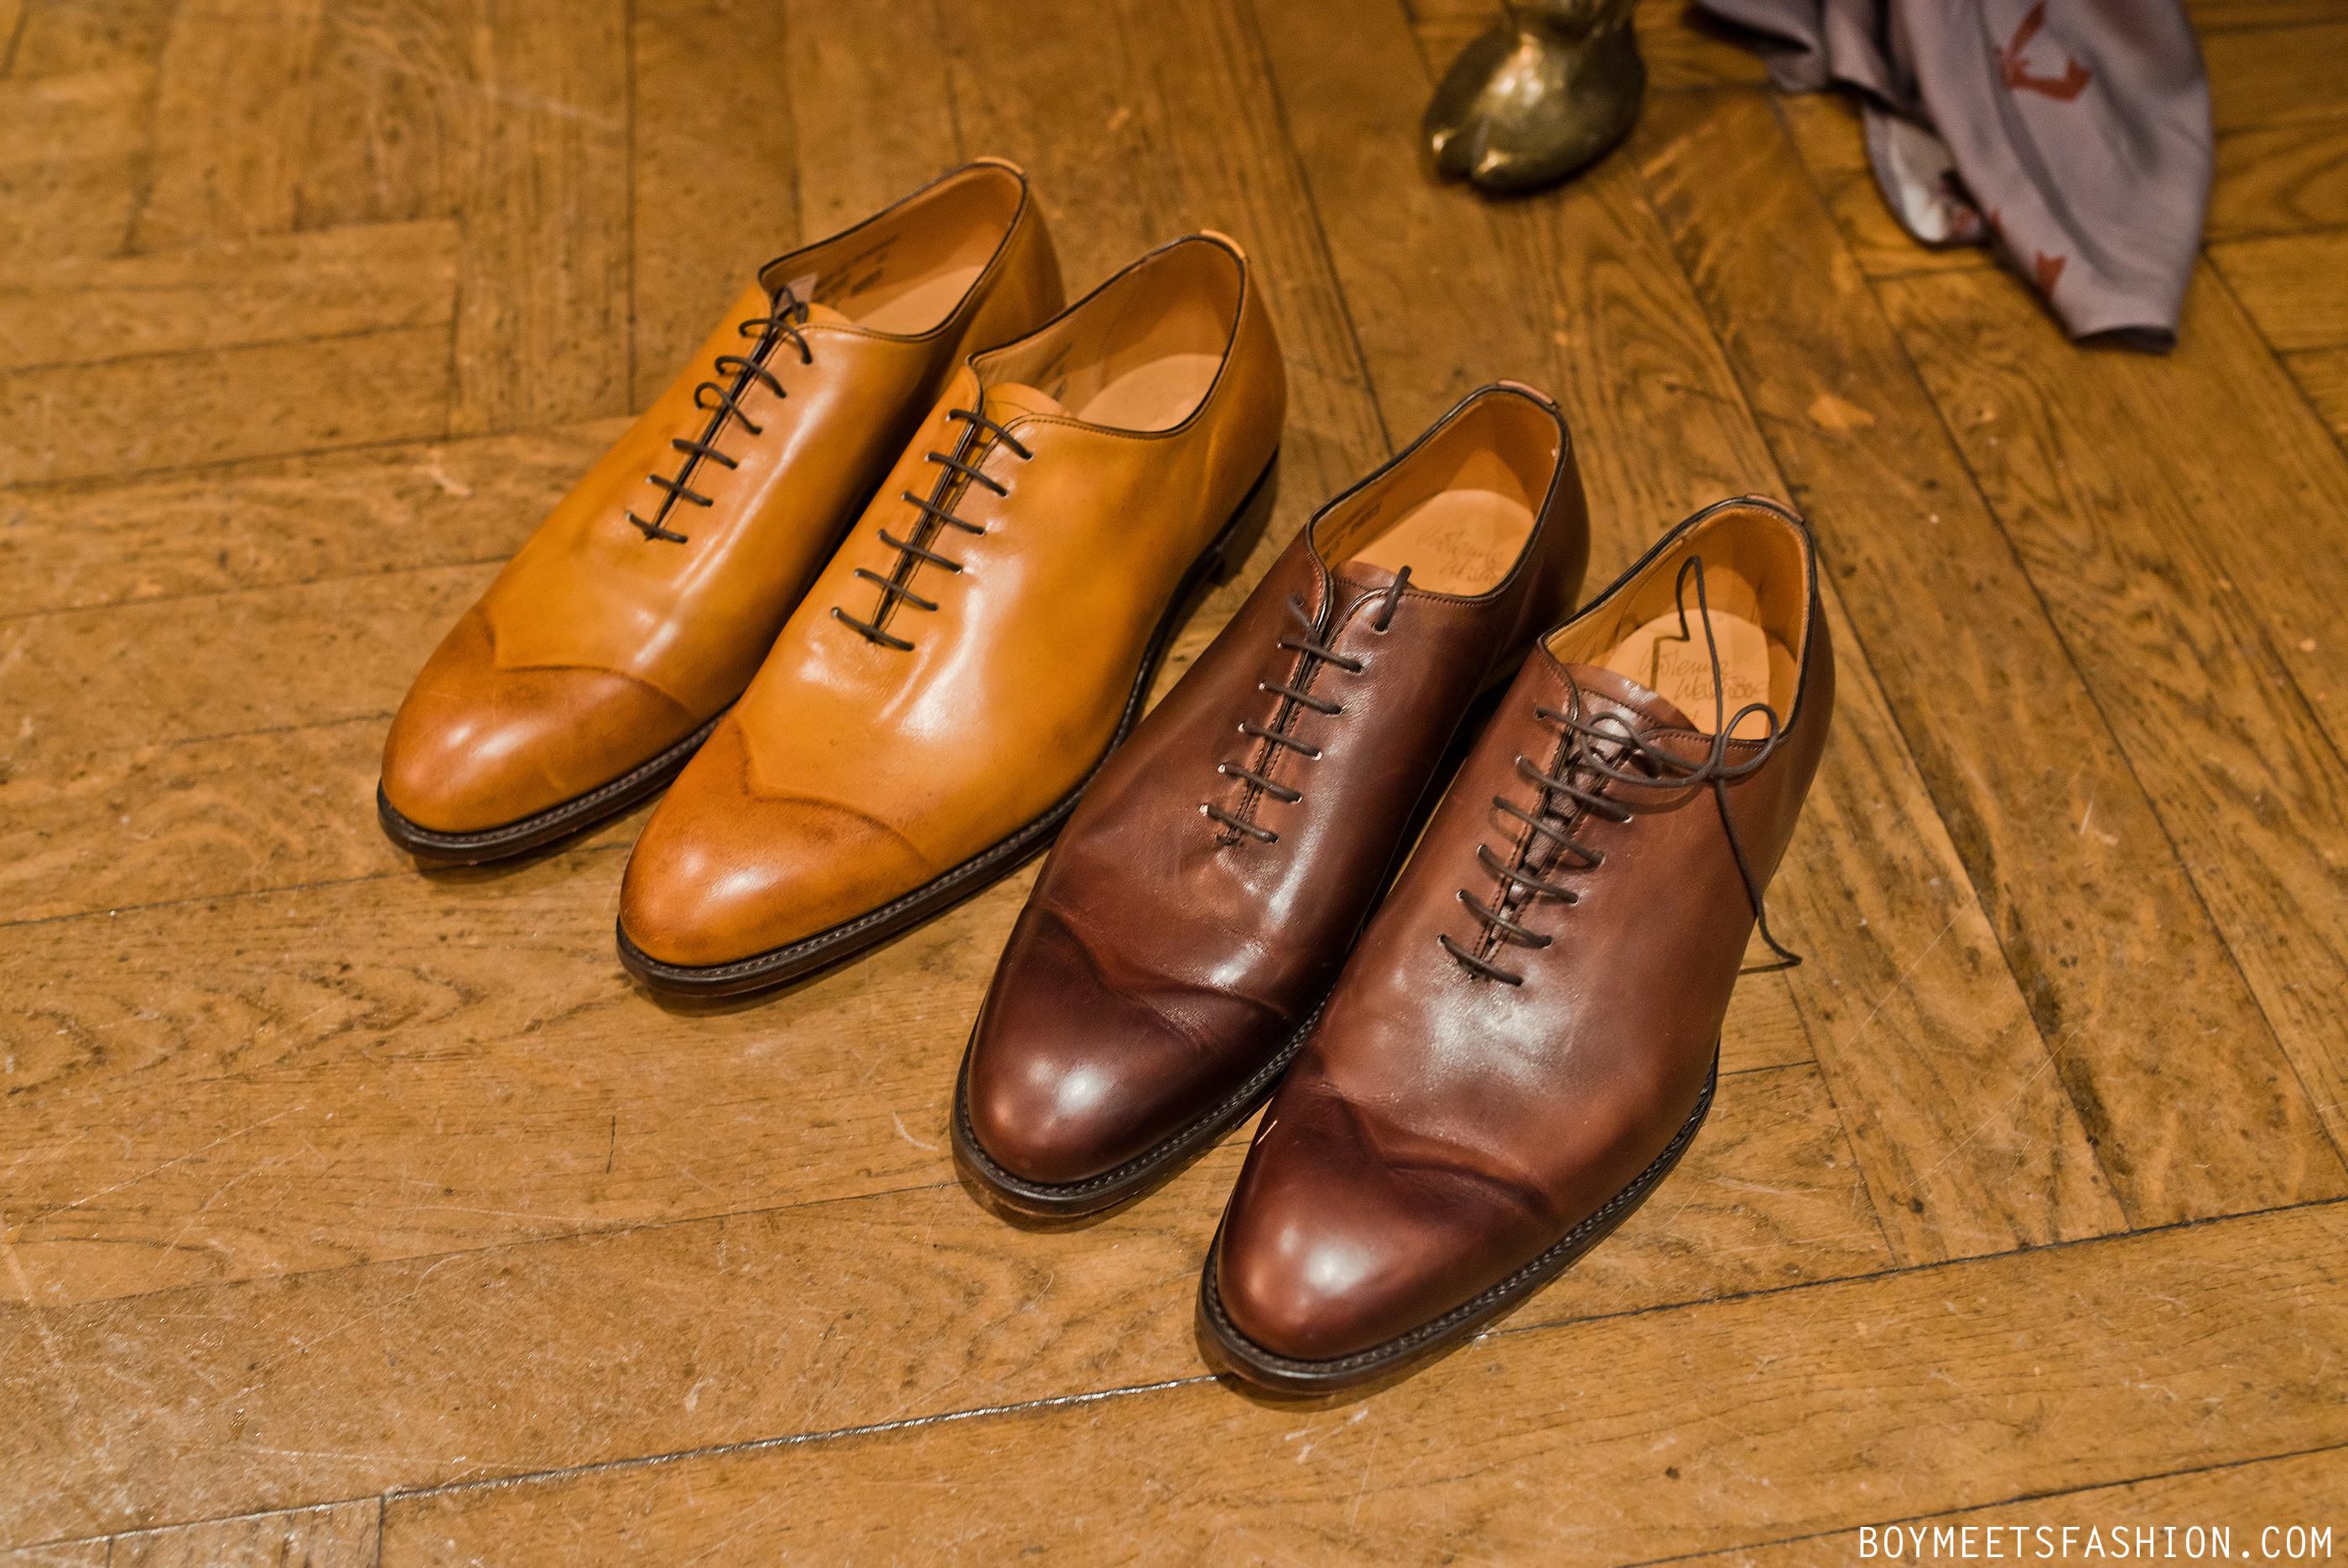 Joseph Cheaney Womens Shoes